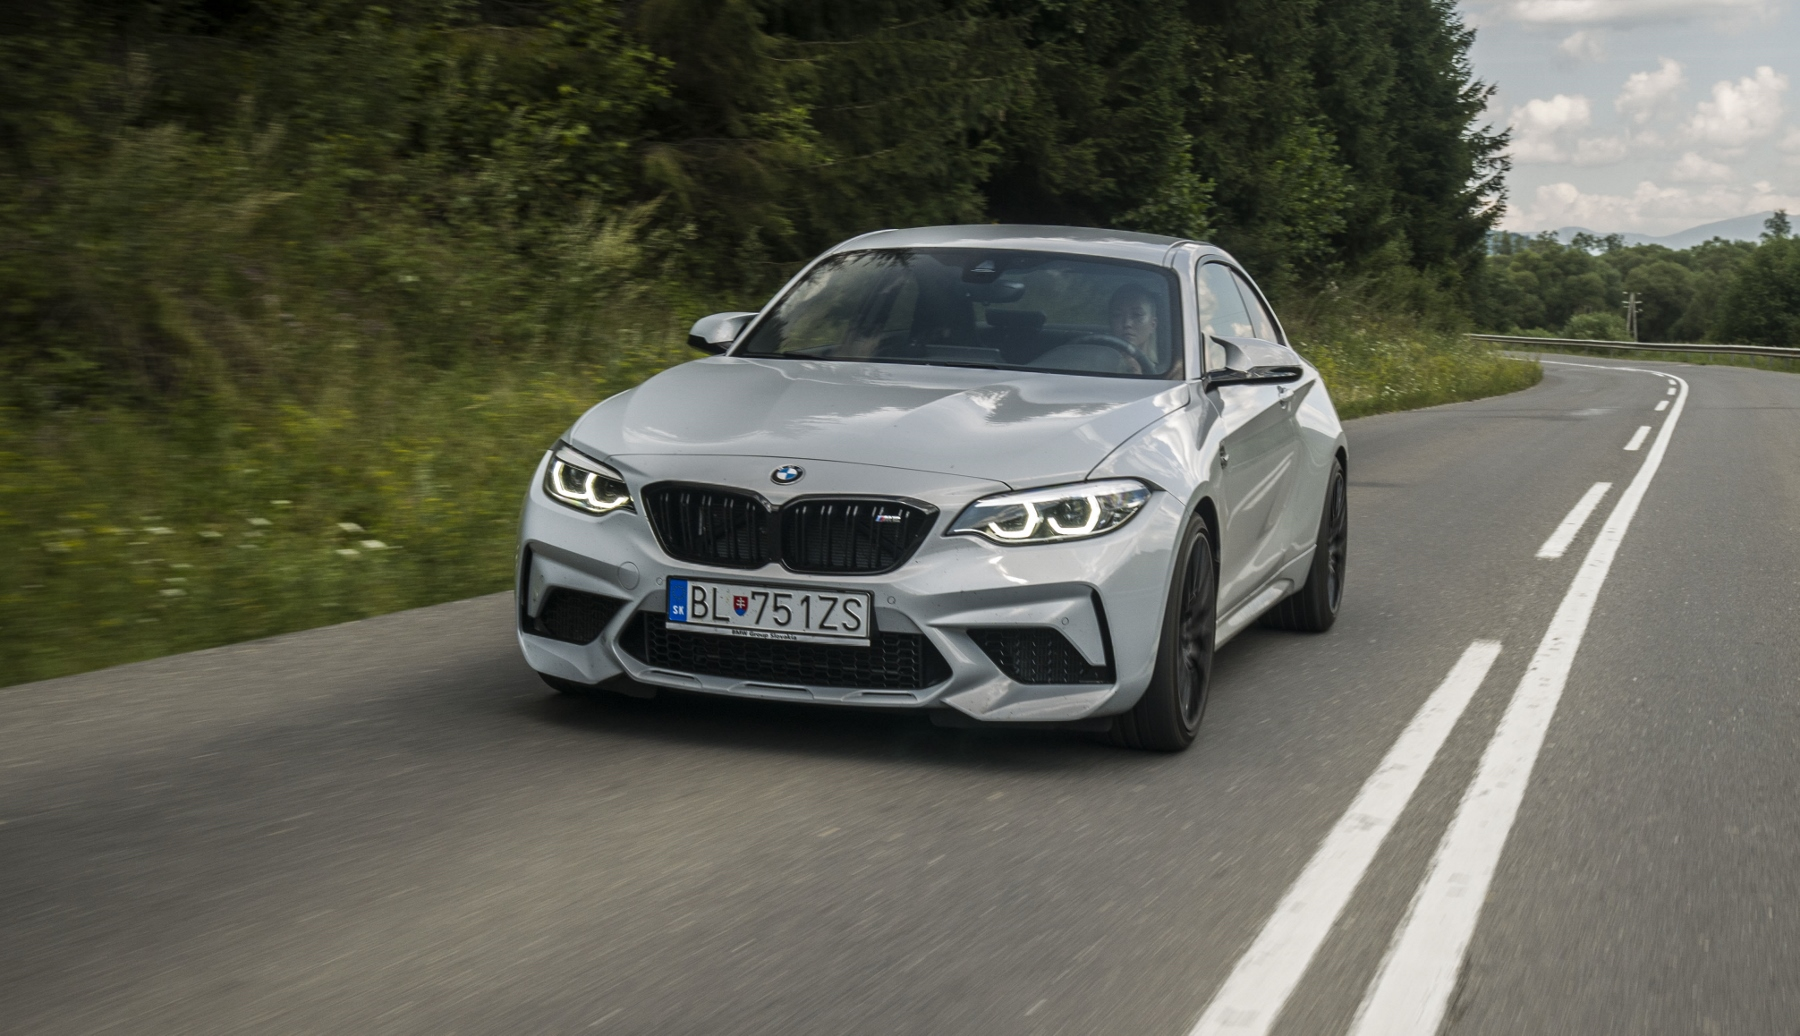 Test: BMW M2 Competition je nálož plná zábavy dBRdMzzWj4 bmw-m2-22